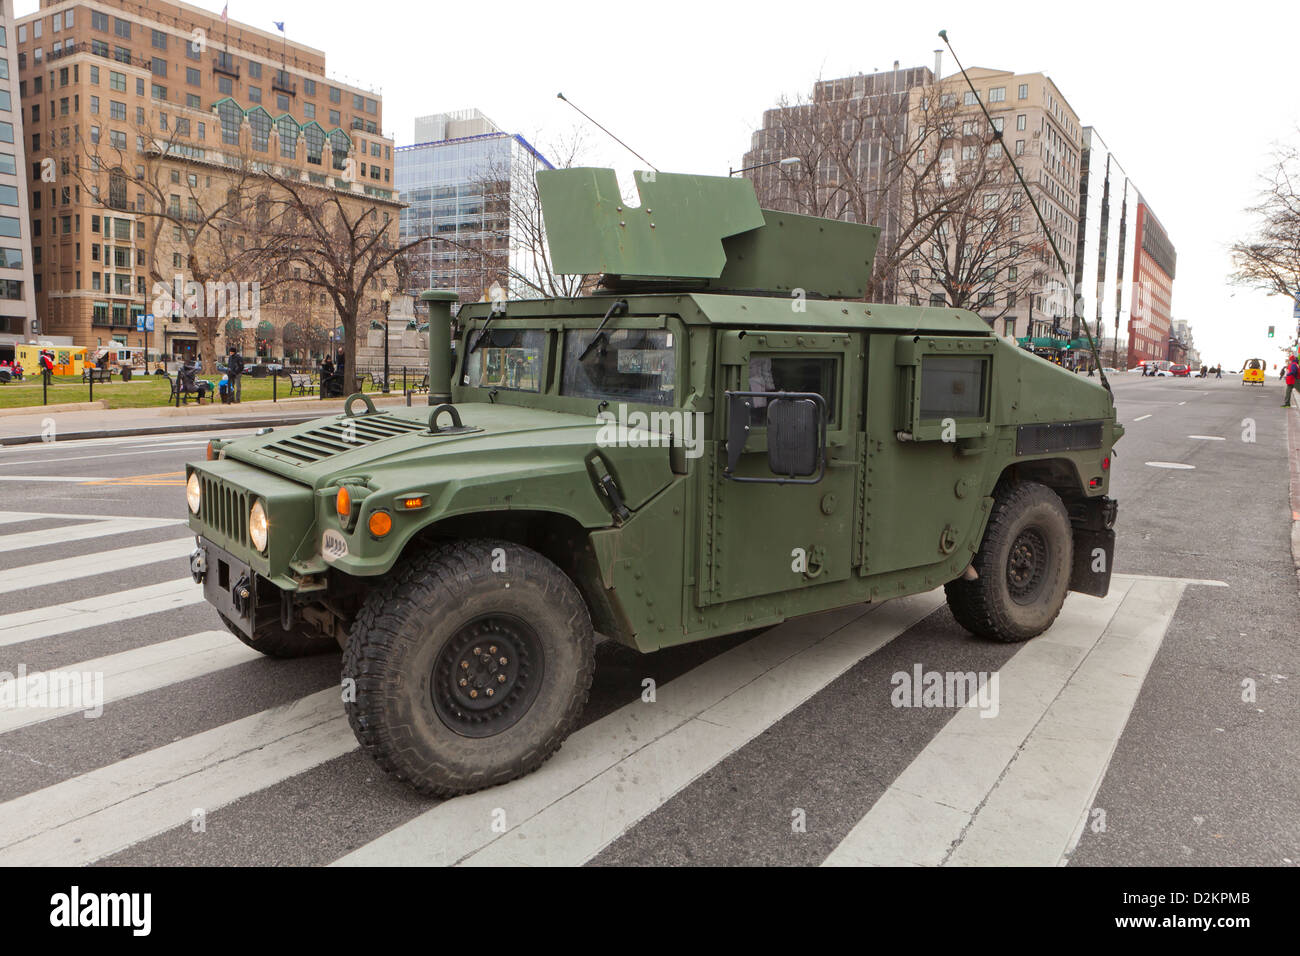 US military Humvee truck - Washington, DC USA Stock Photo: 53295323